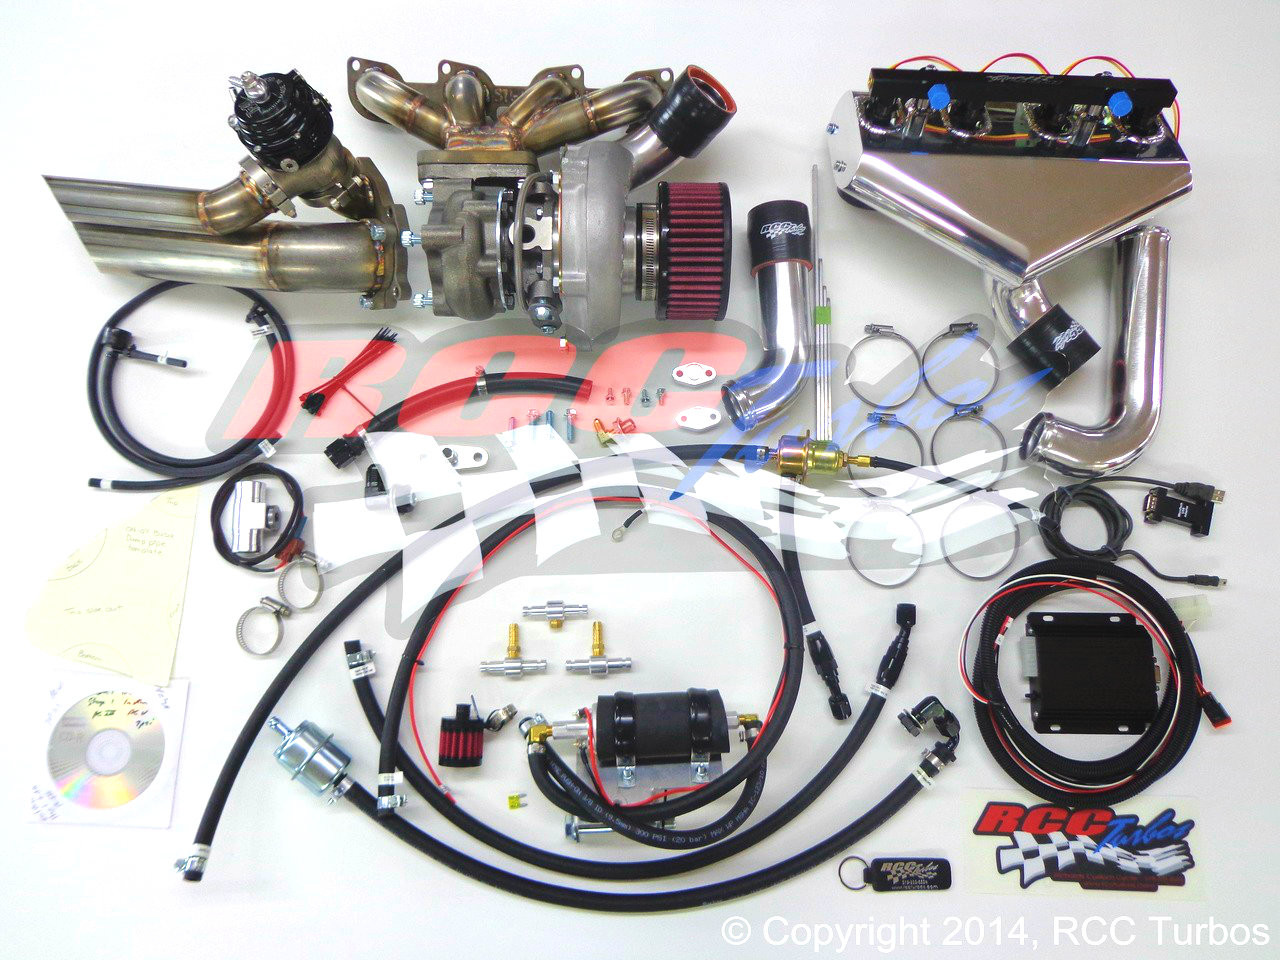 07 hayabusa wiring diagram 1997 jeep cherokee yzf r6 turbo kit diagrams repair scheme